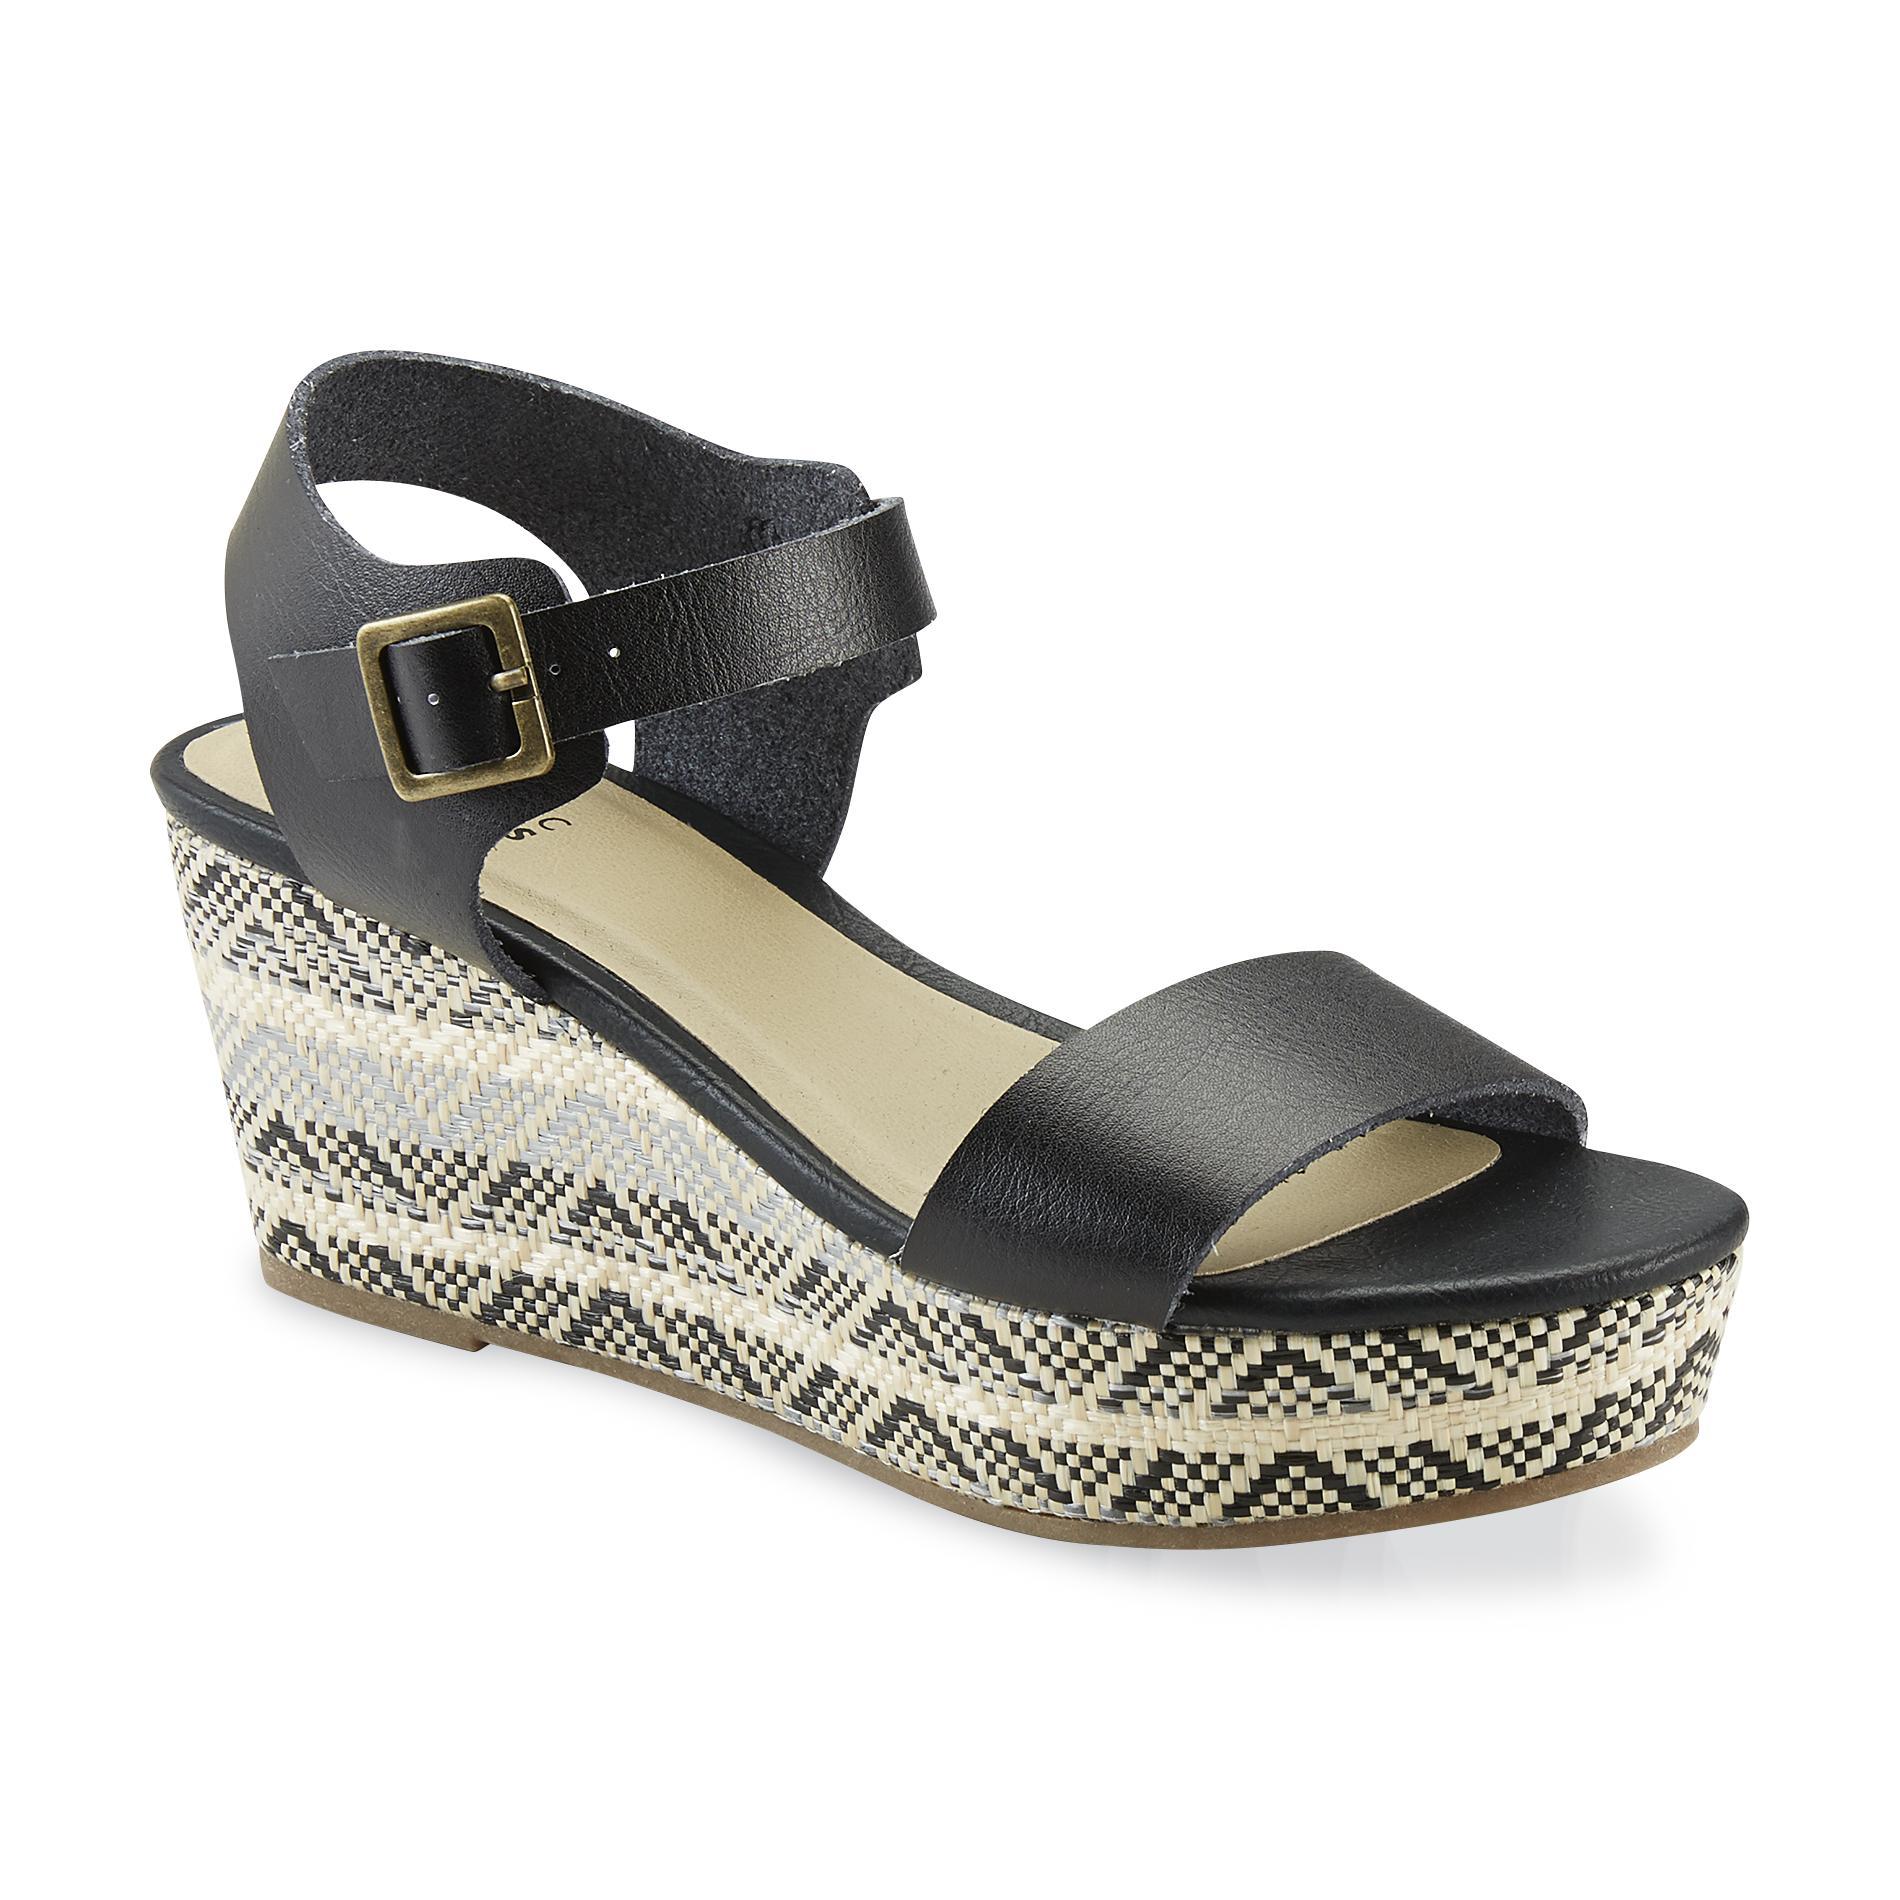 Basic Editions Women's Wallie Black/Tan/Tribal Wedge Sandal